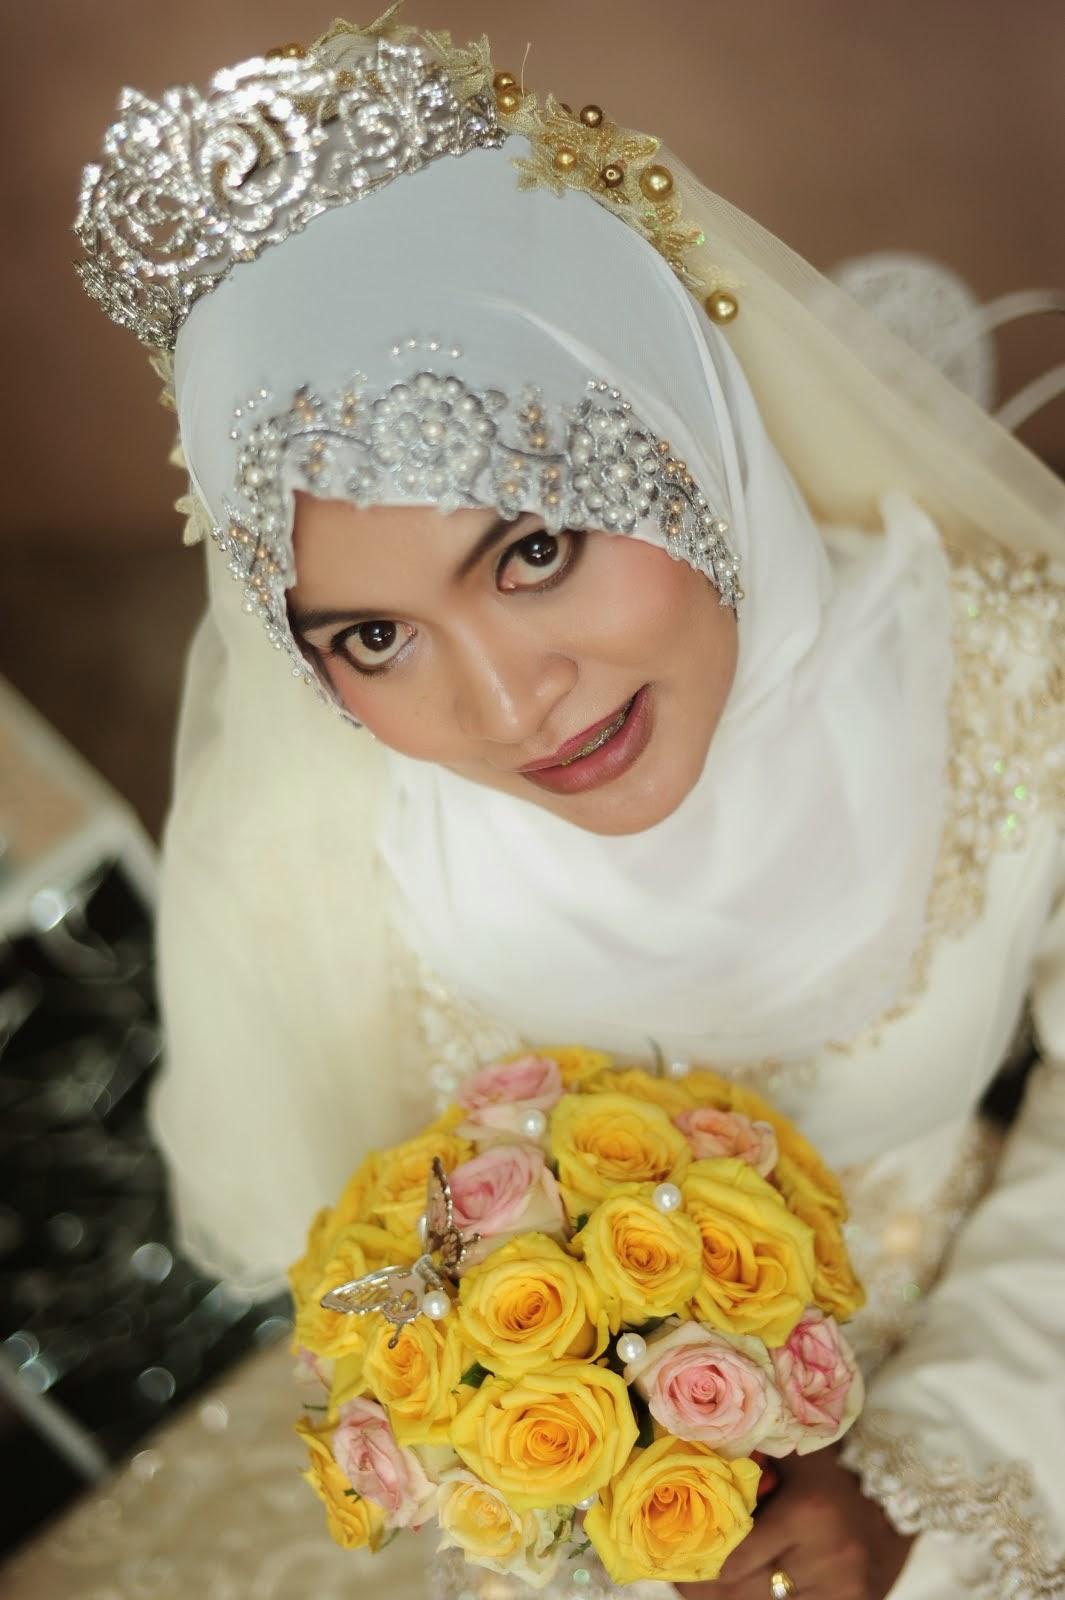 Owner Diy Kerja Kahwin